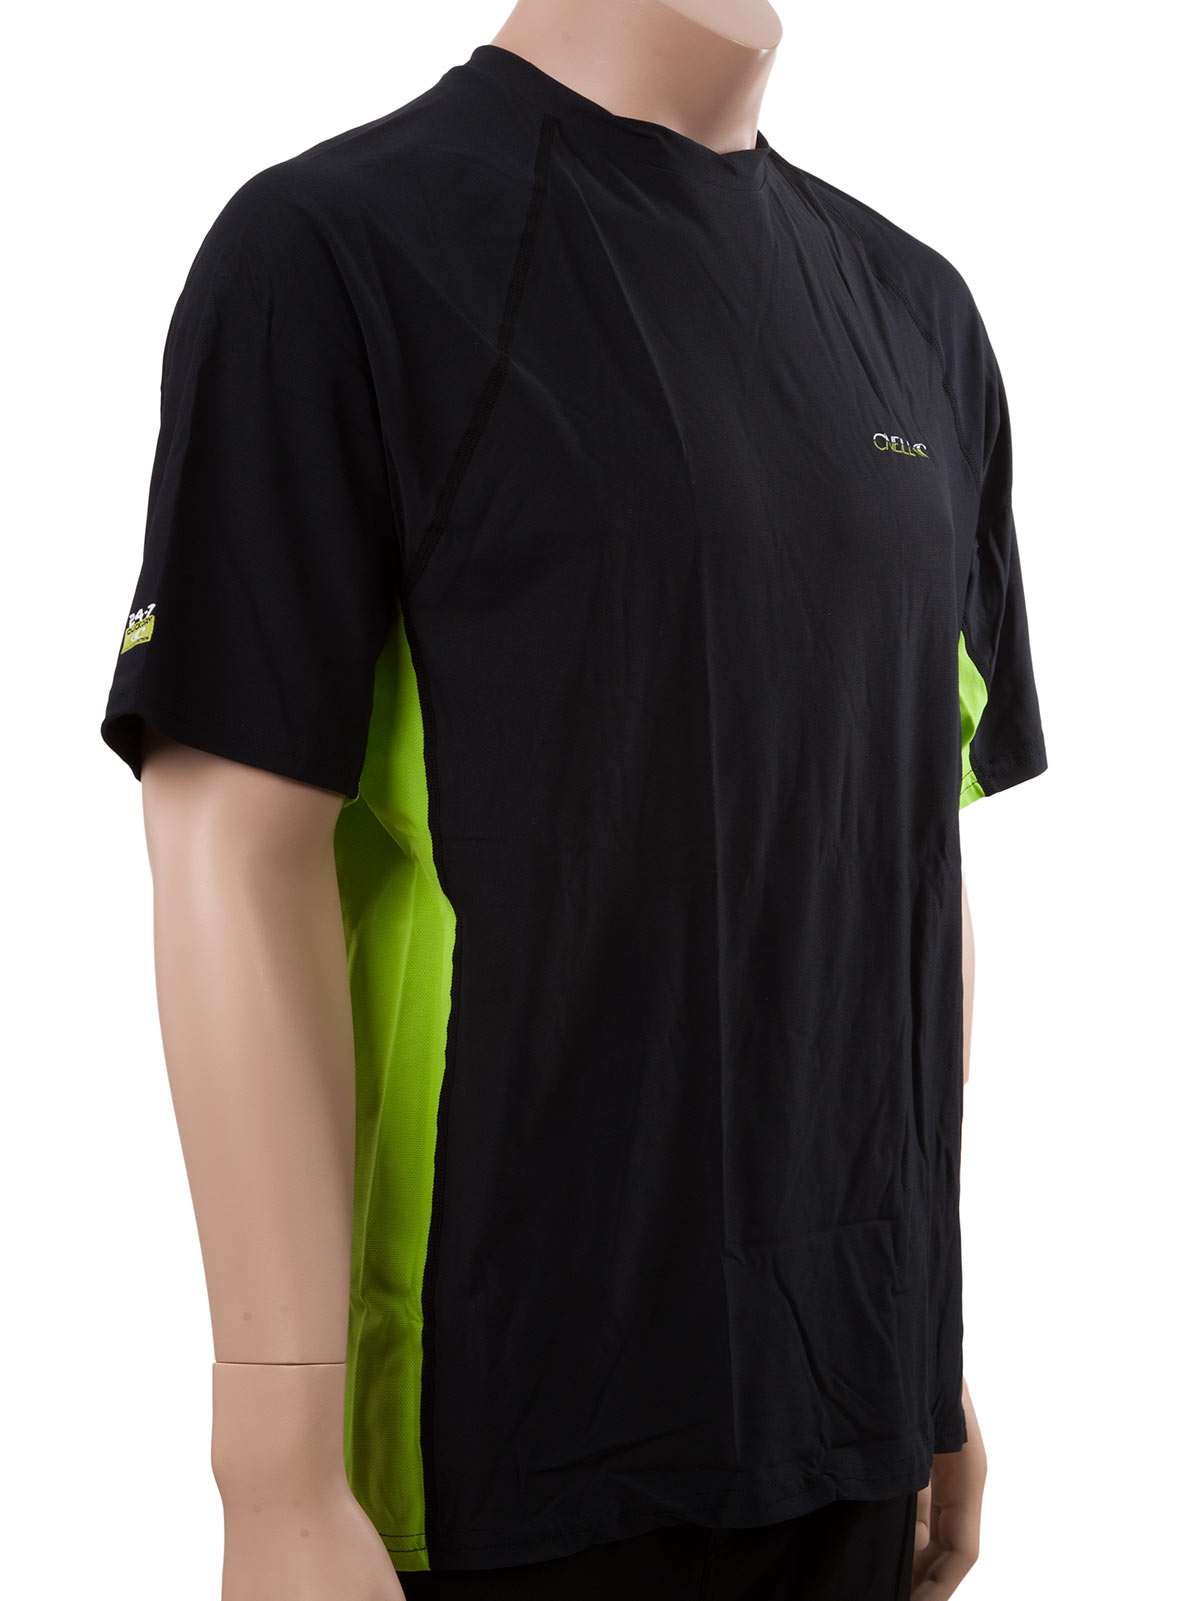 O'Neill Men 24/7 Sun Tee: Looser Fit Rashguard Swim Shirt...